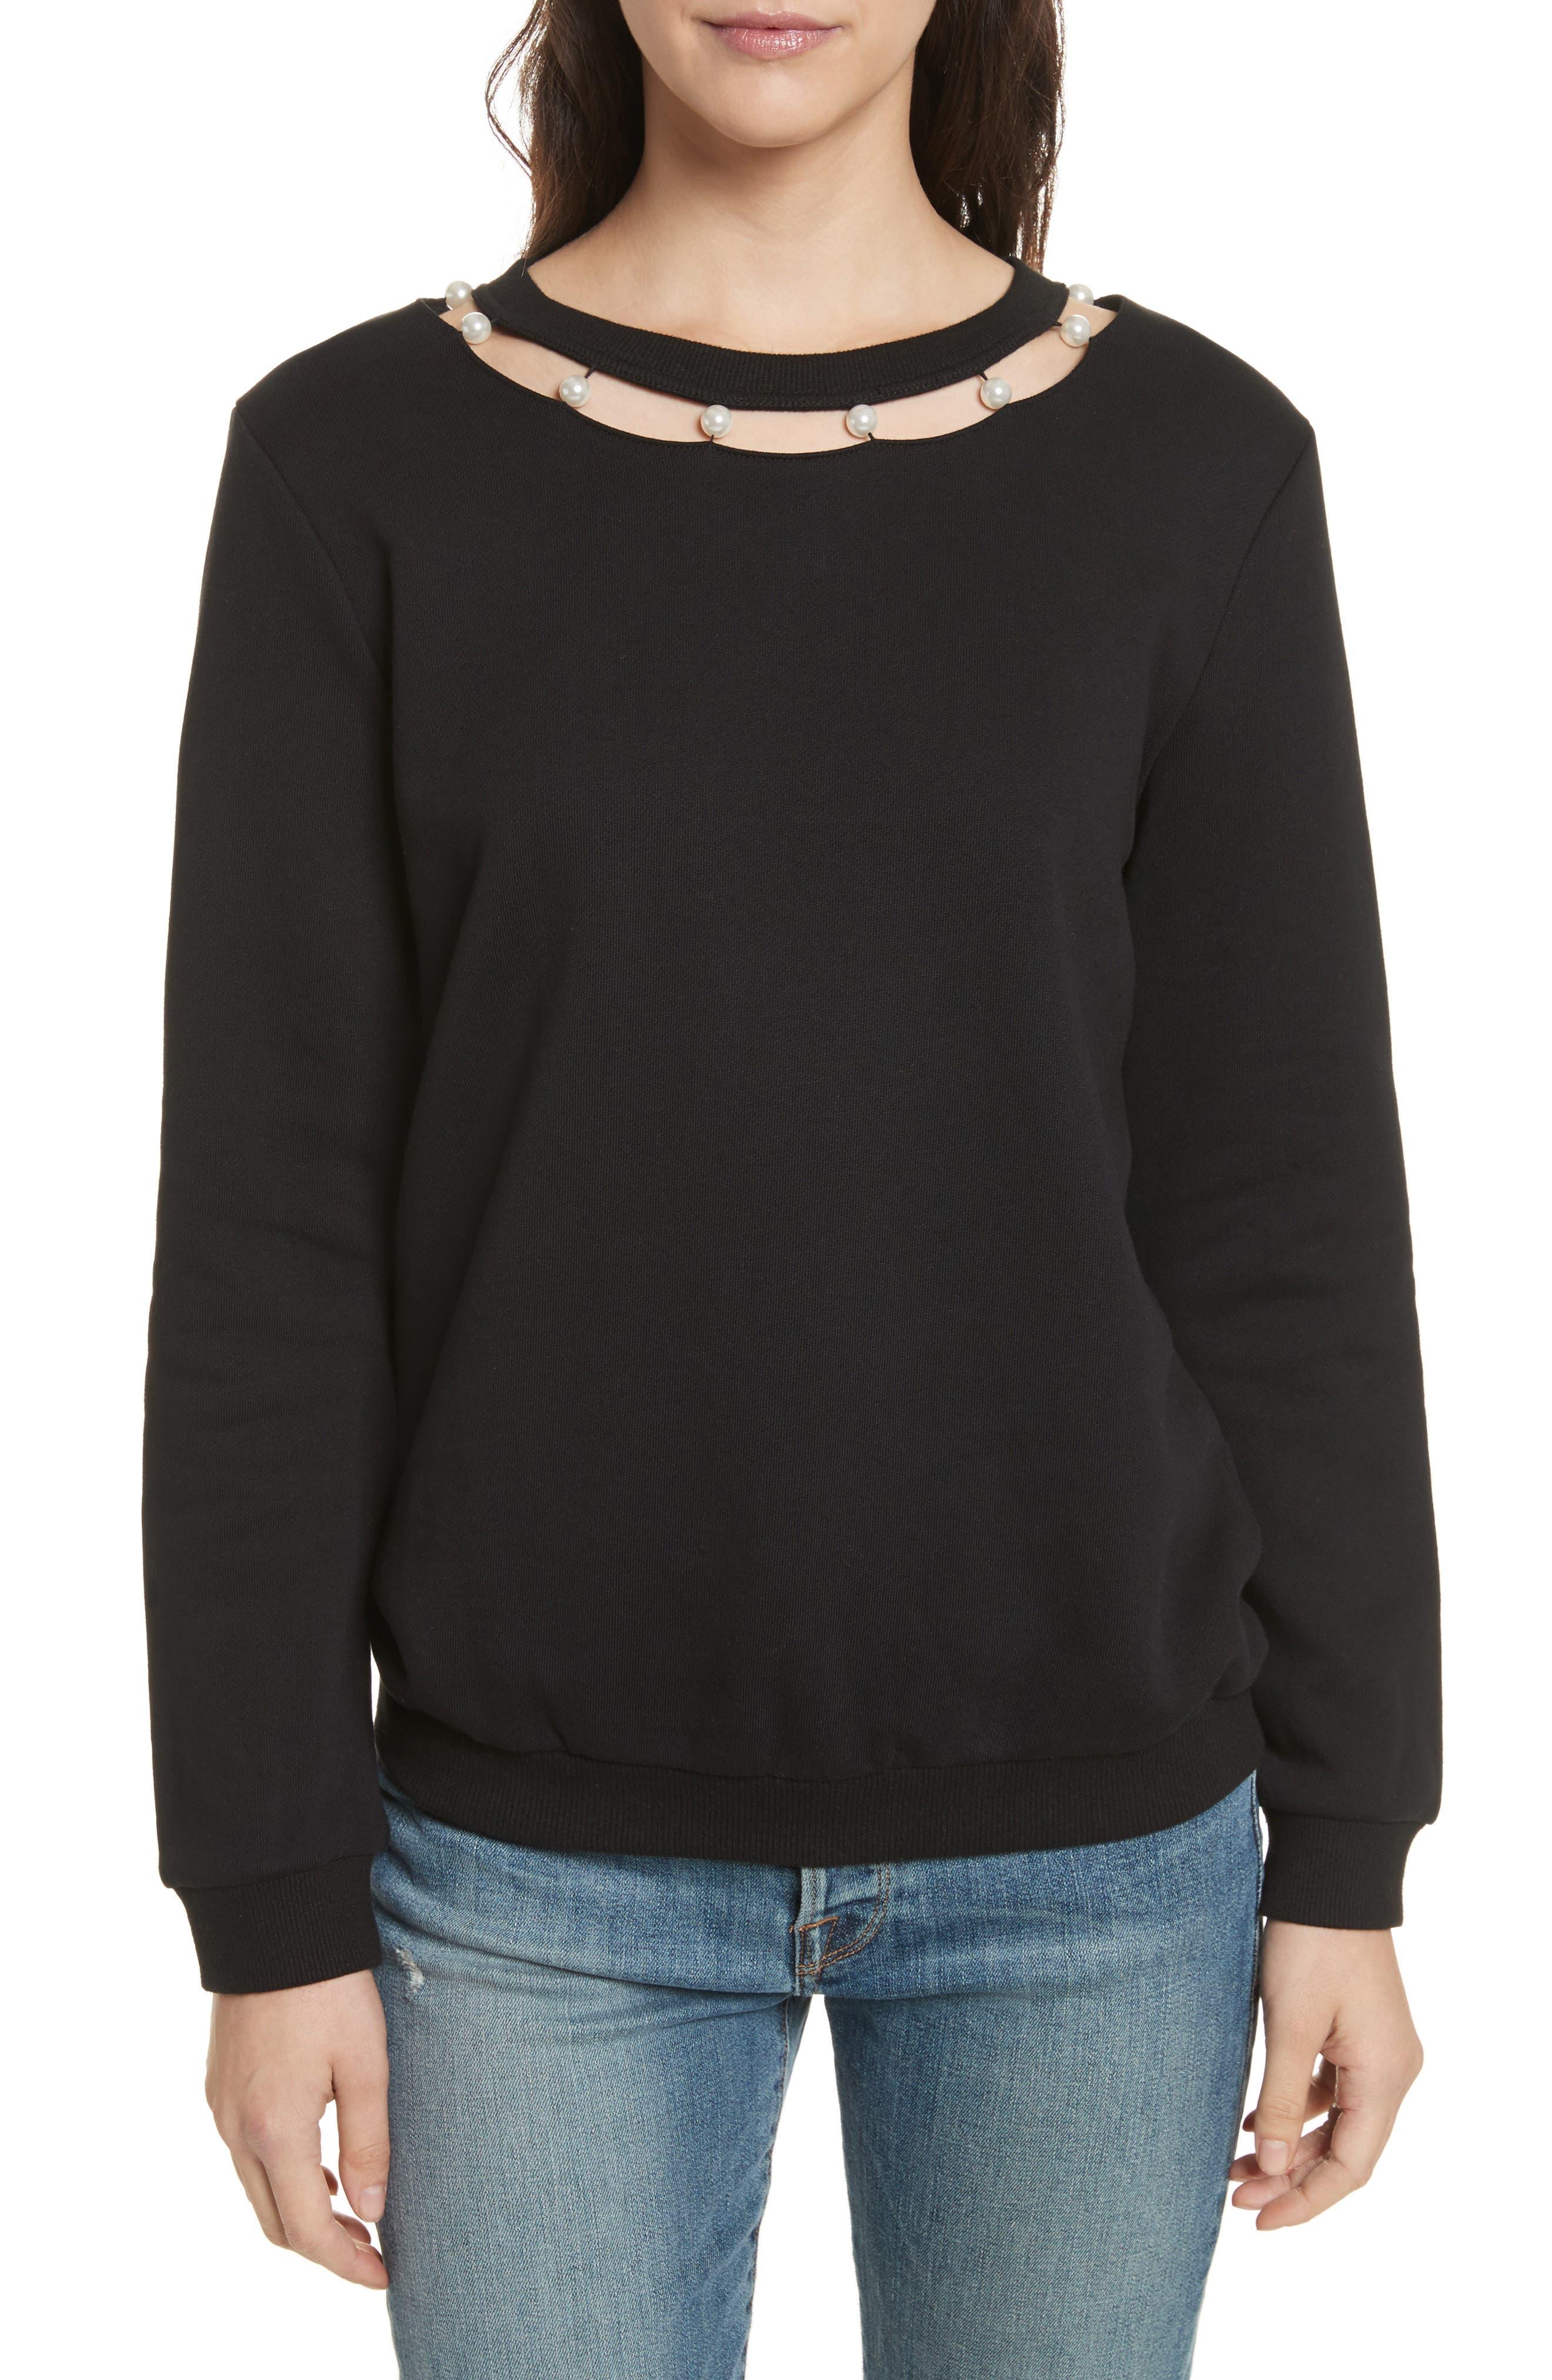 Rebecca Minkoff Imitation Pearl Neckline Sweatshirt